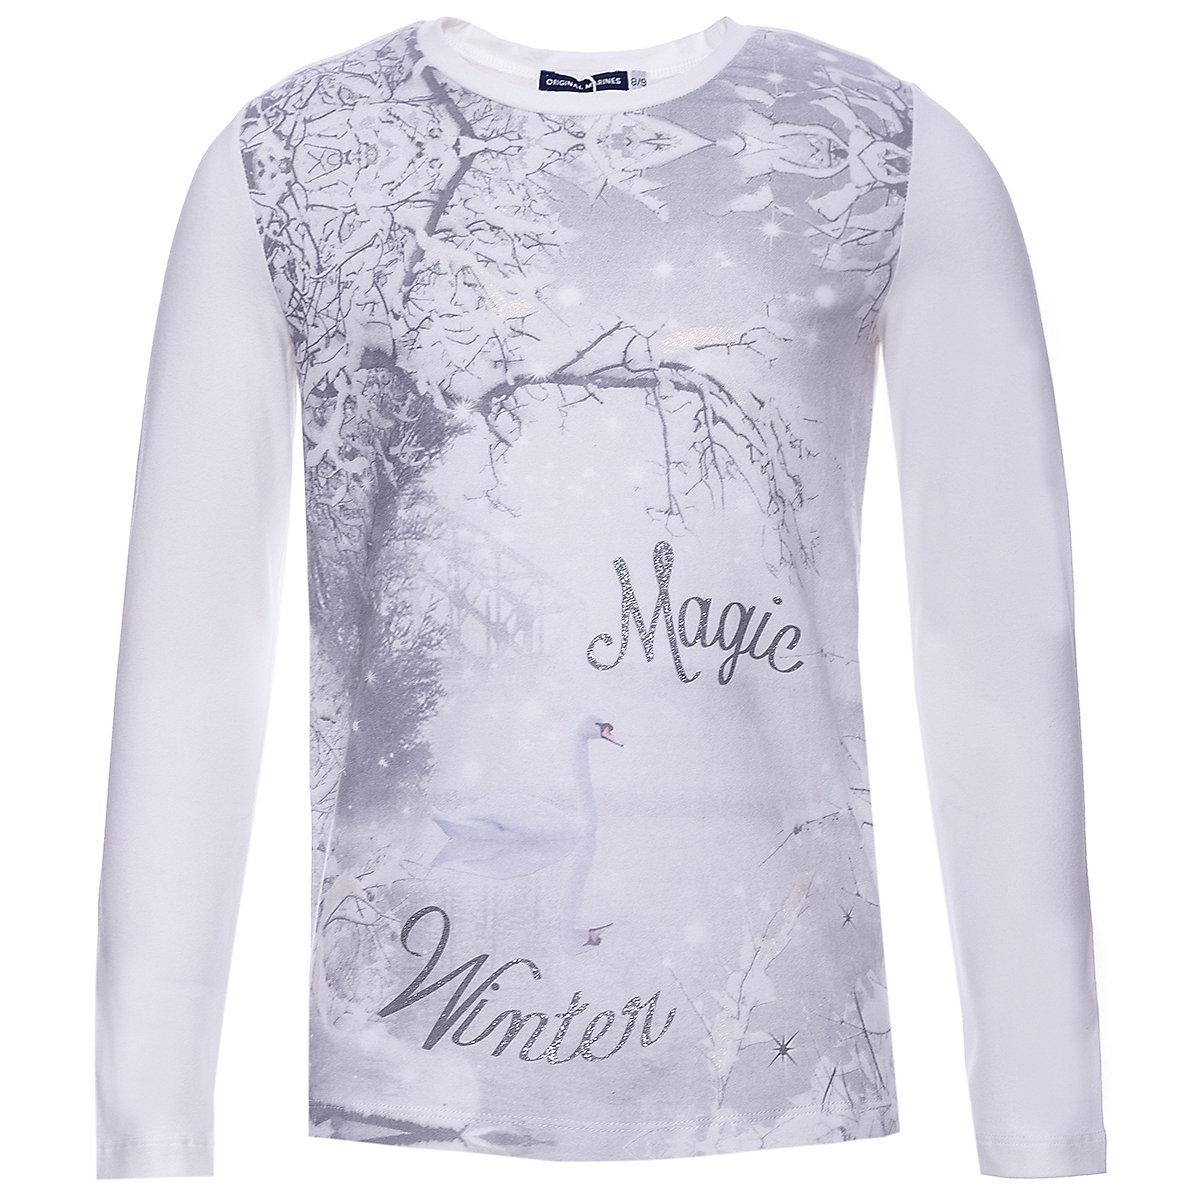 Original Marines Hoodies & Sweatshirts 10245541 Cotton Girls Casual children clothing girl hoodies